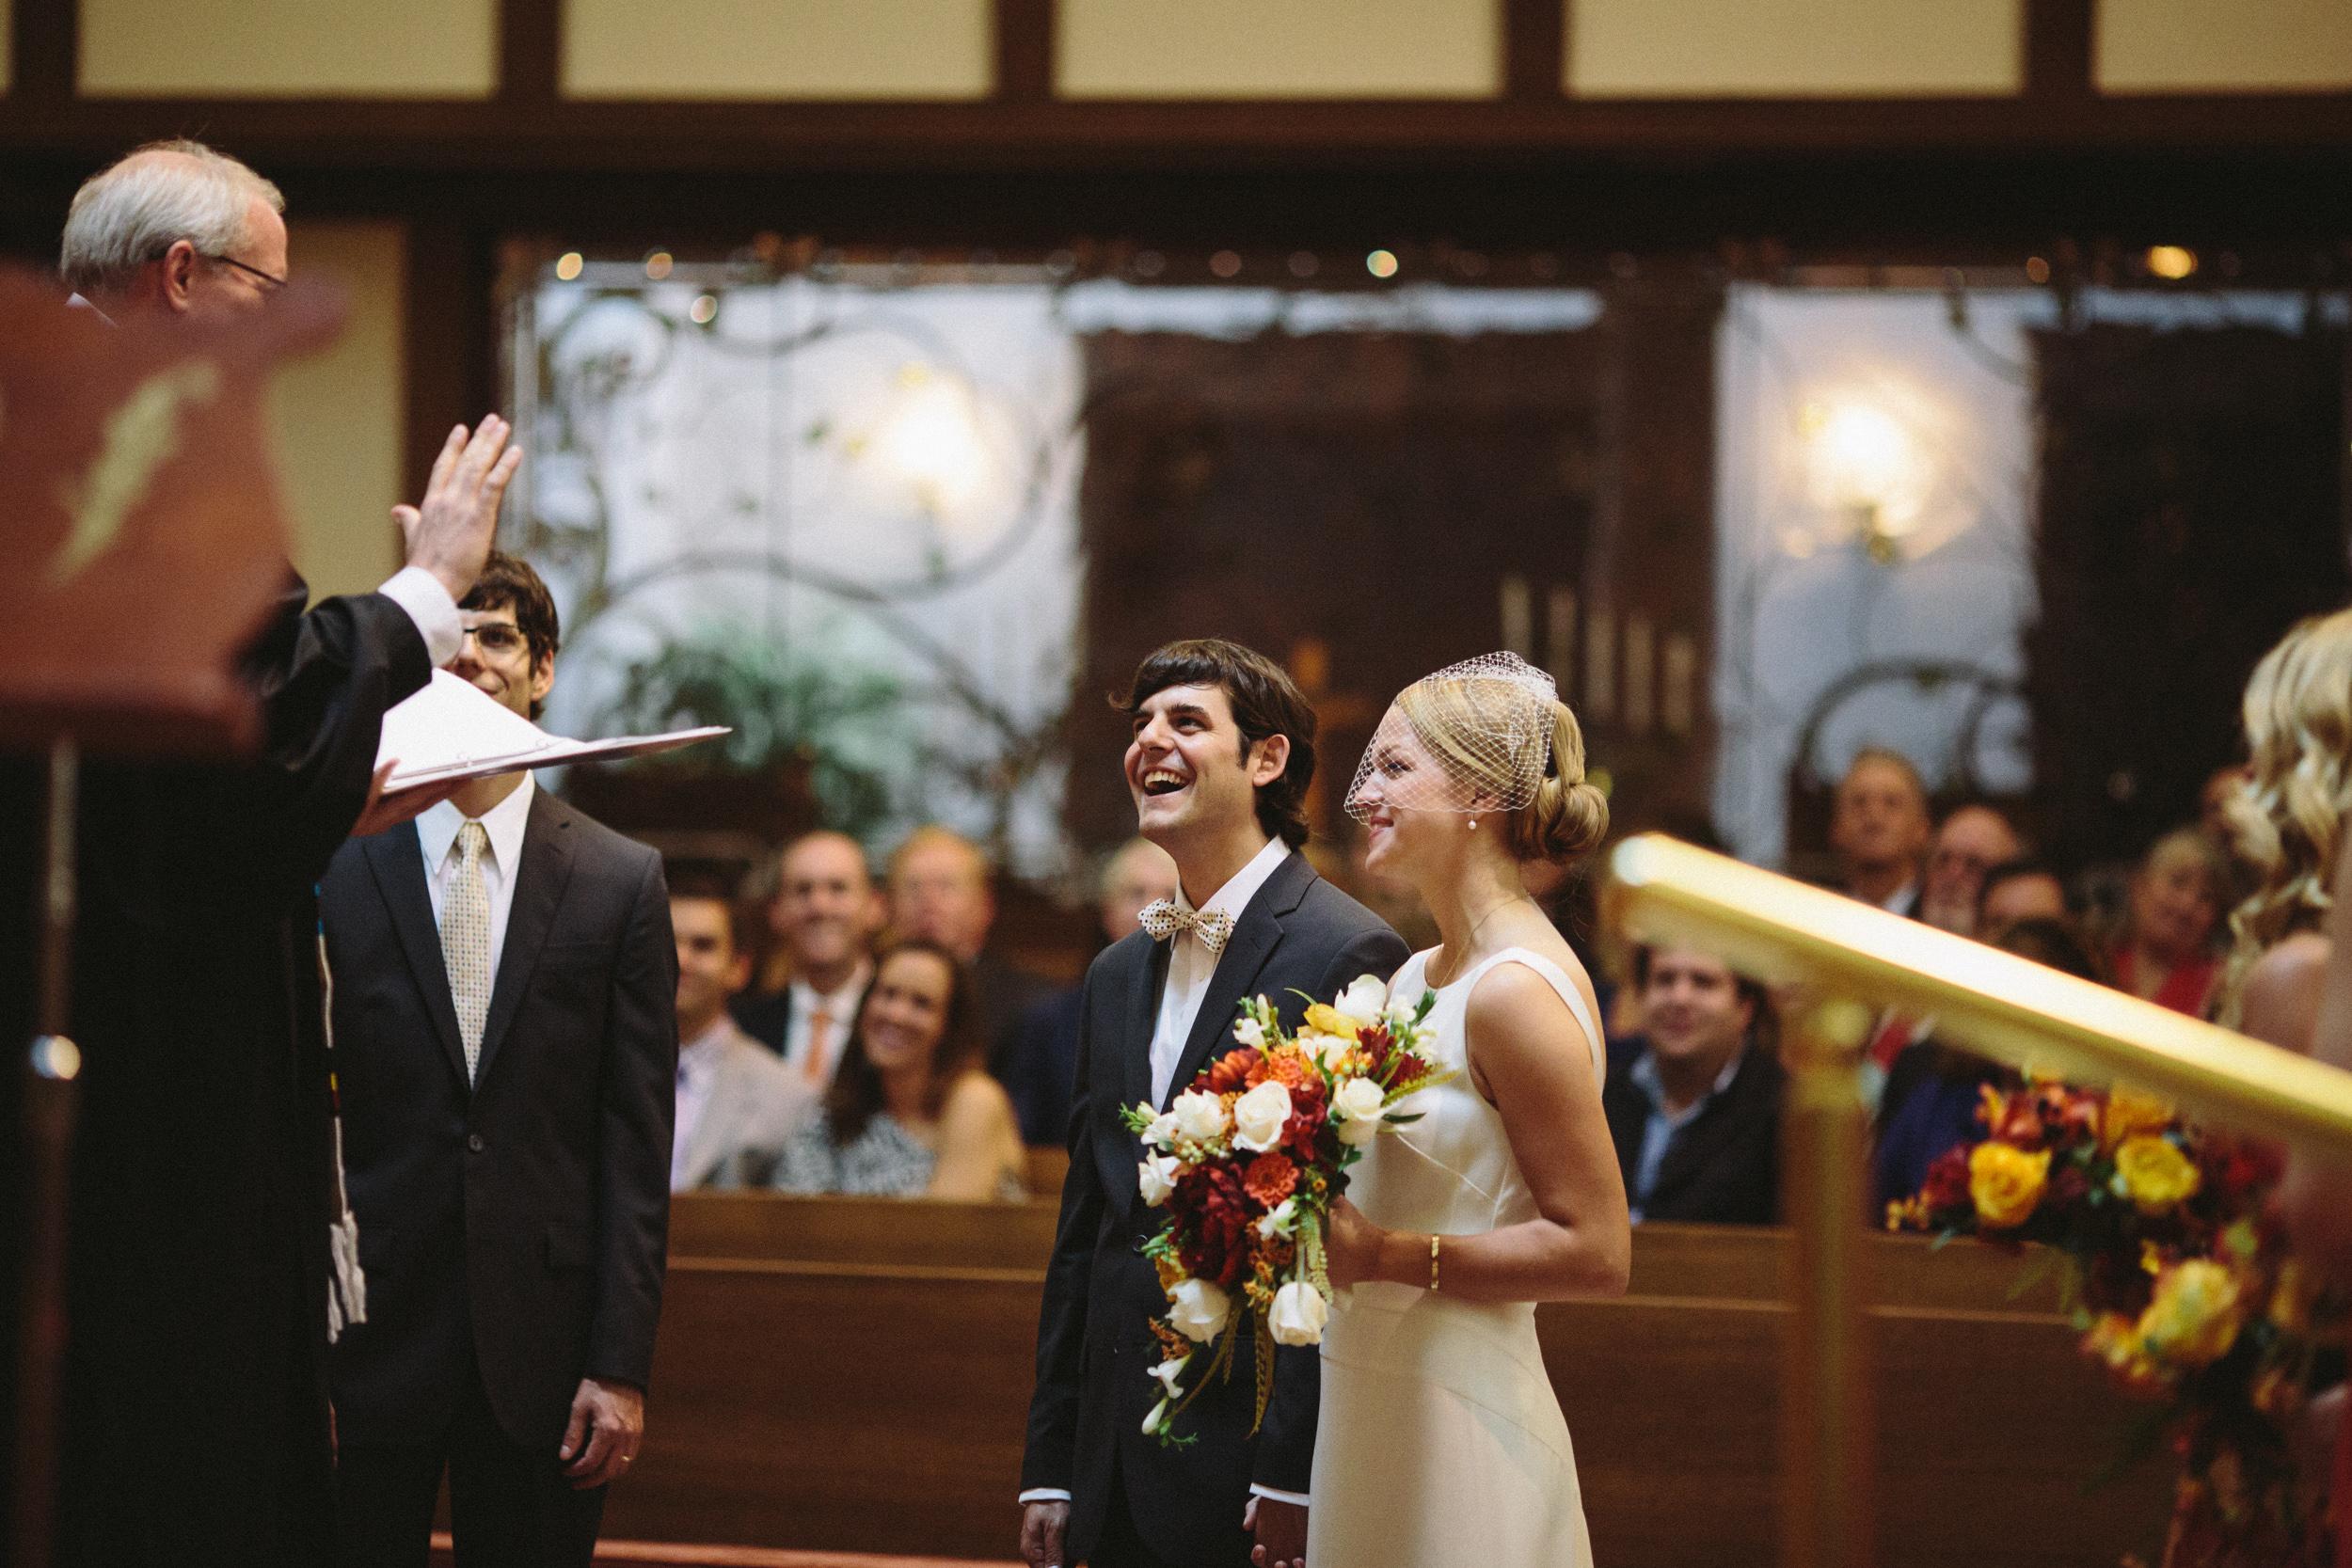 10-05-2013 maggie & adam wedding photography by brian milo-132.jpg